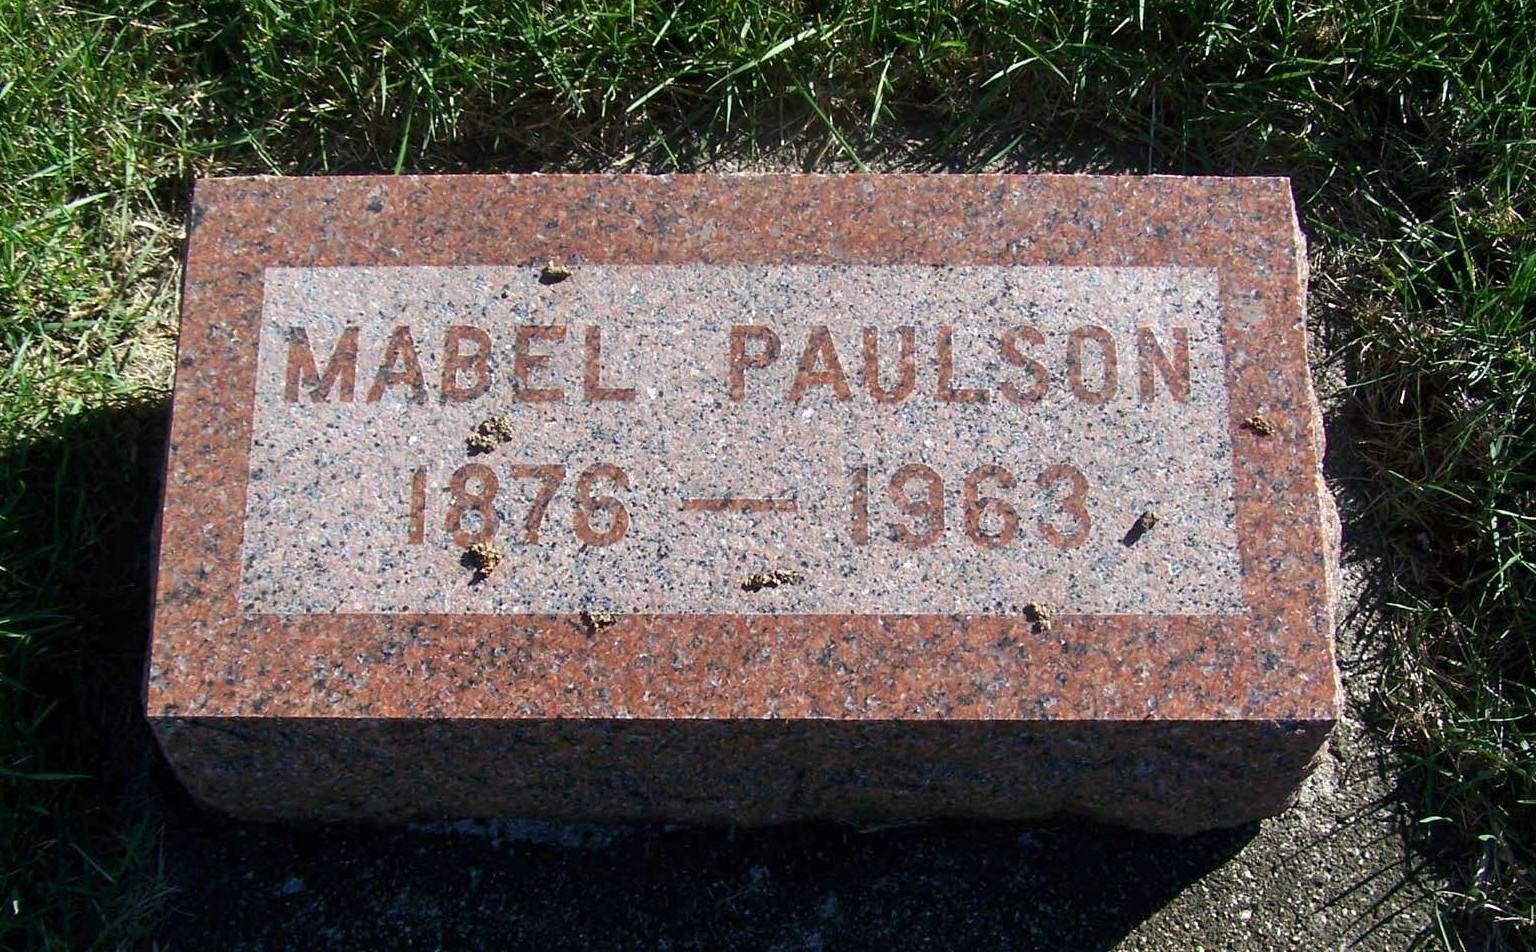 Mabel Gertrude Paulson